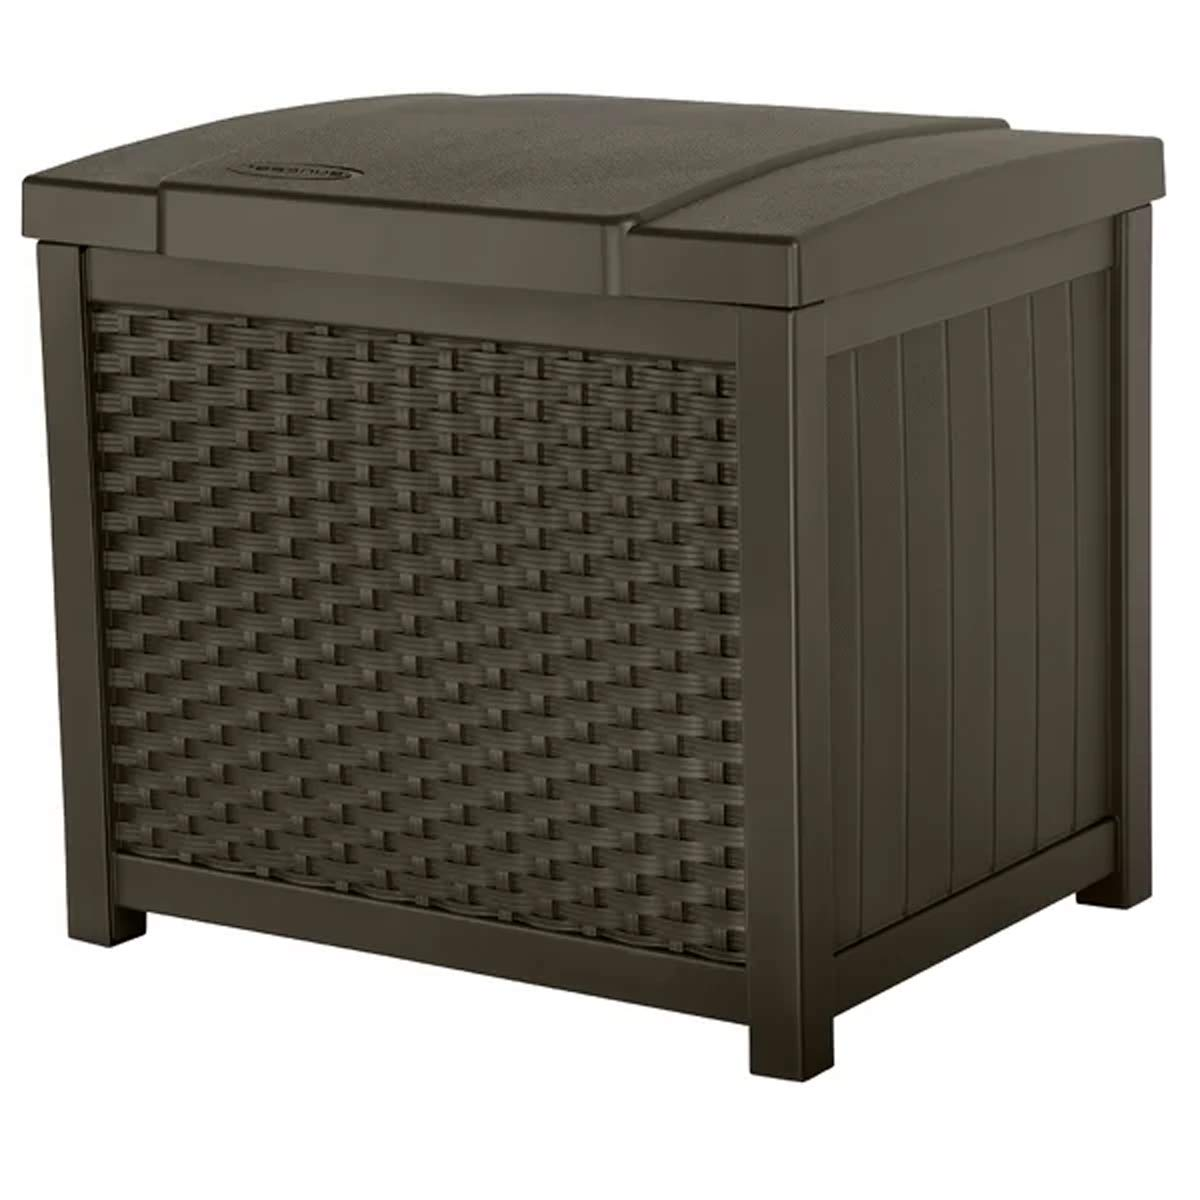 J&M Outdoor Patio Resin Deck Box 22 Gallon Garden Supplies Storage Container in Brown Finish